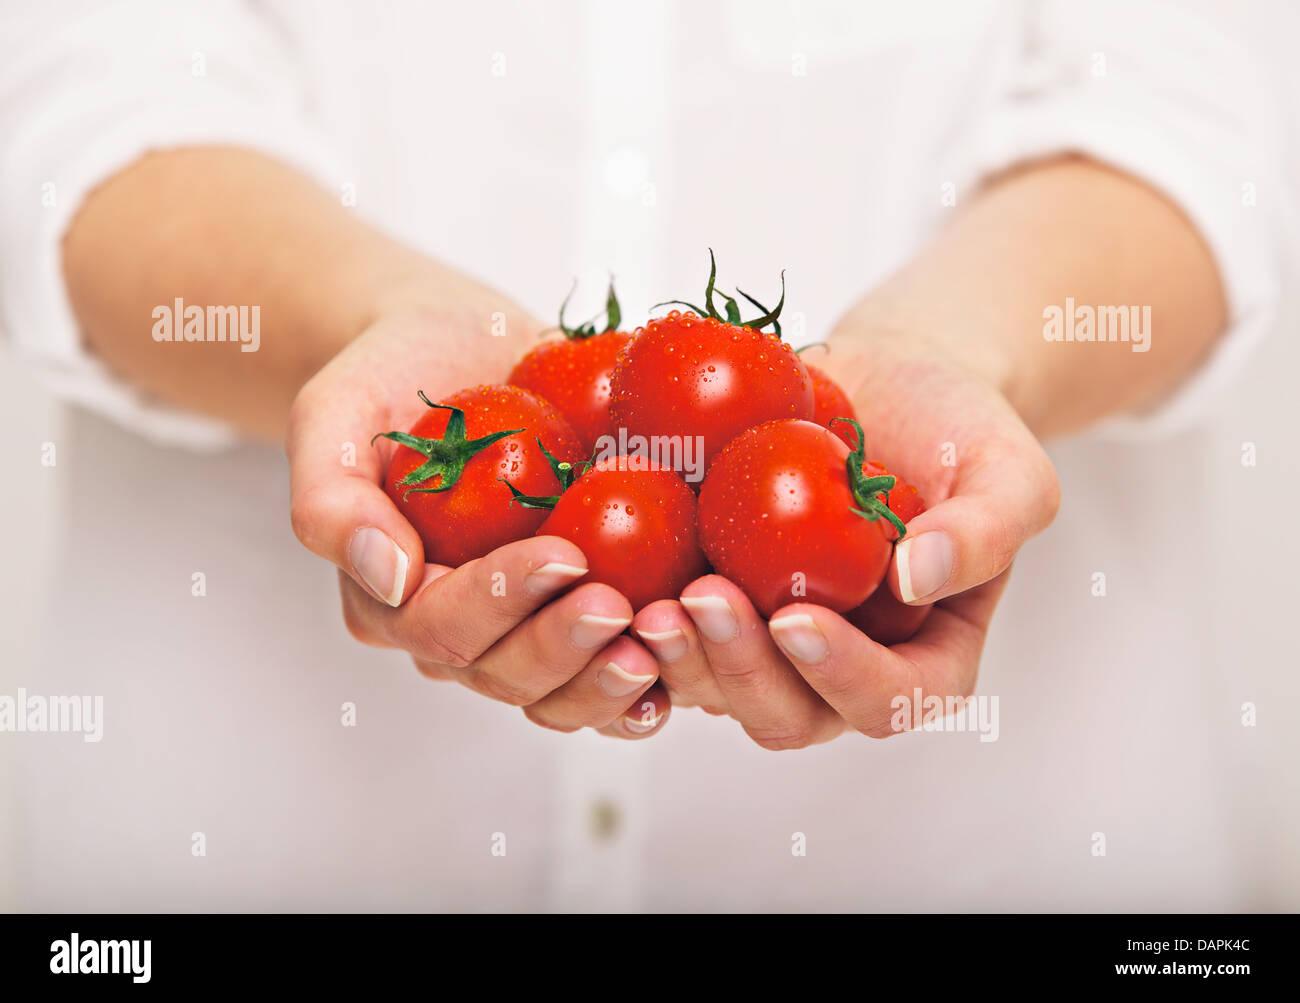 Female's both hands holding fresh tomatoes - Stock Image